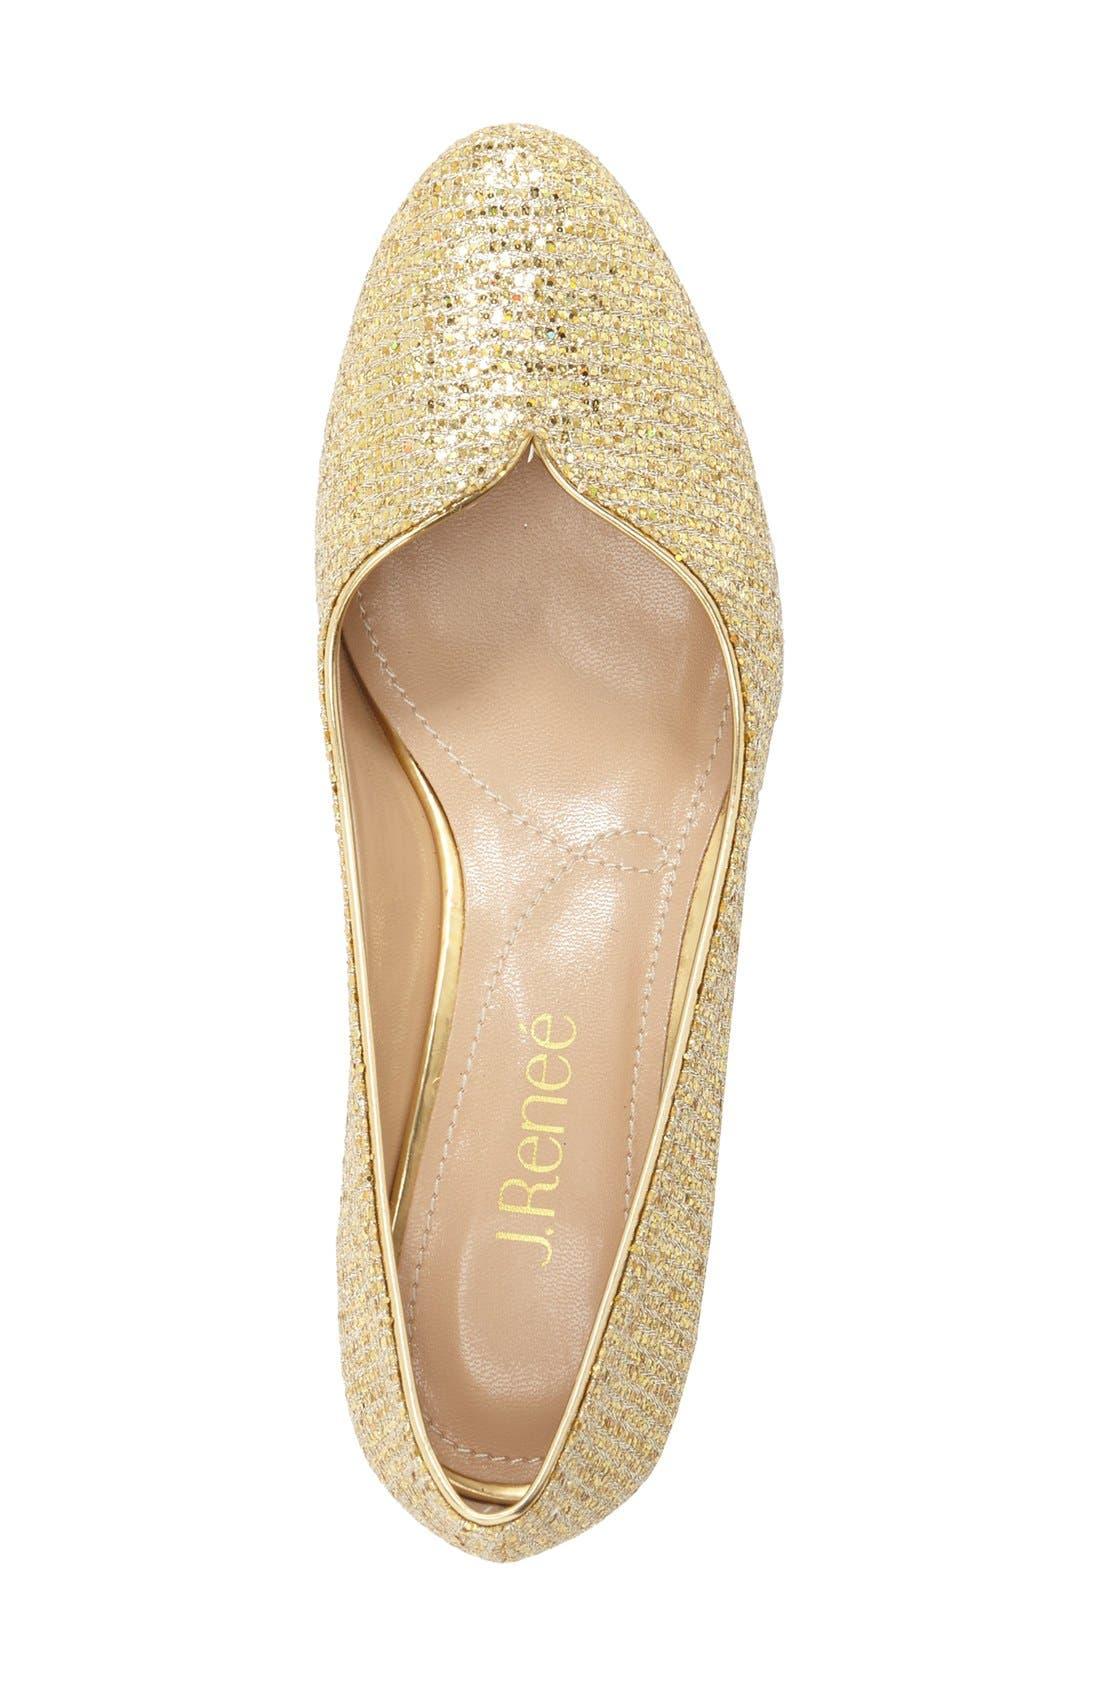 'Bambalina' Block Heel Glitter Pump,                             Alternate thumbnail 3, color,                             Gold Glitter Fabric